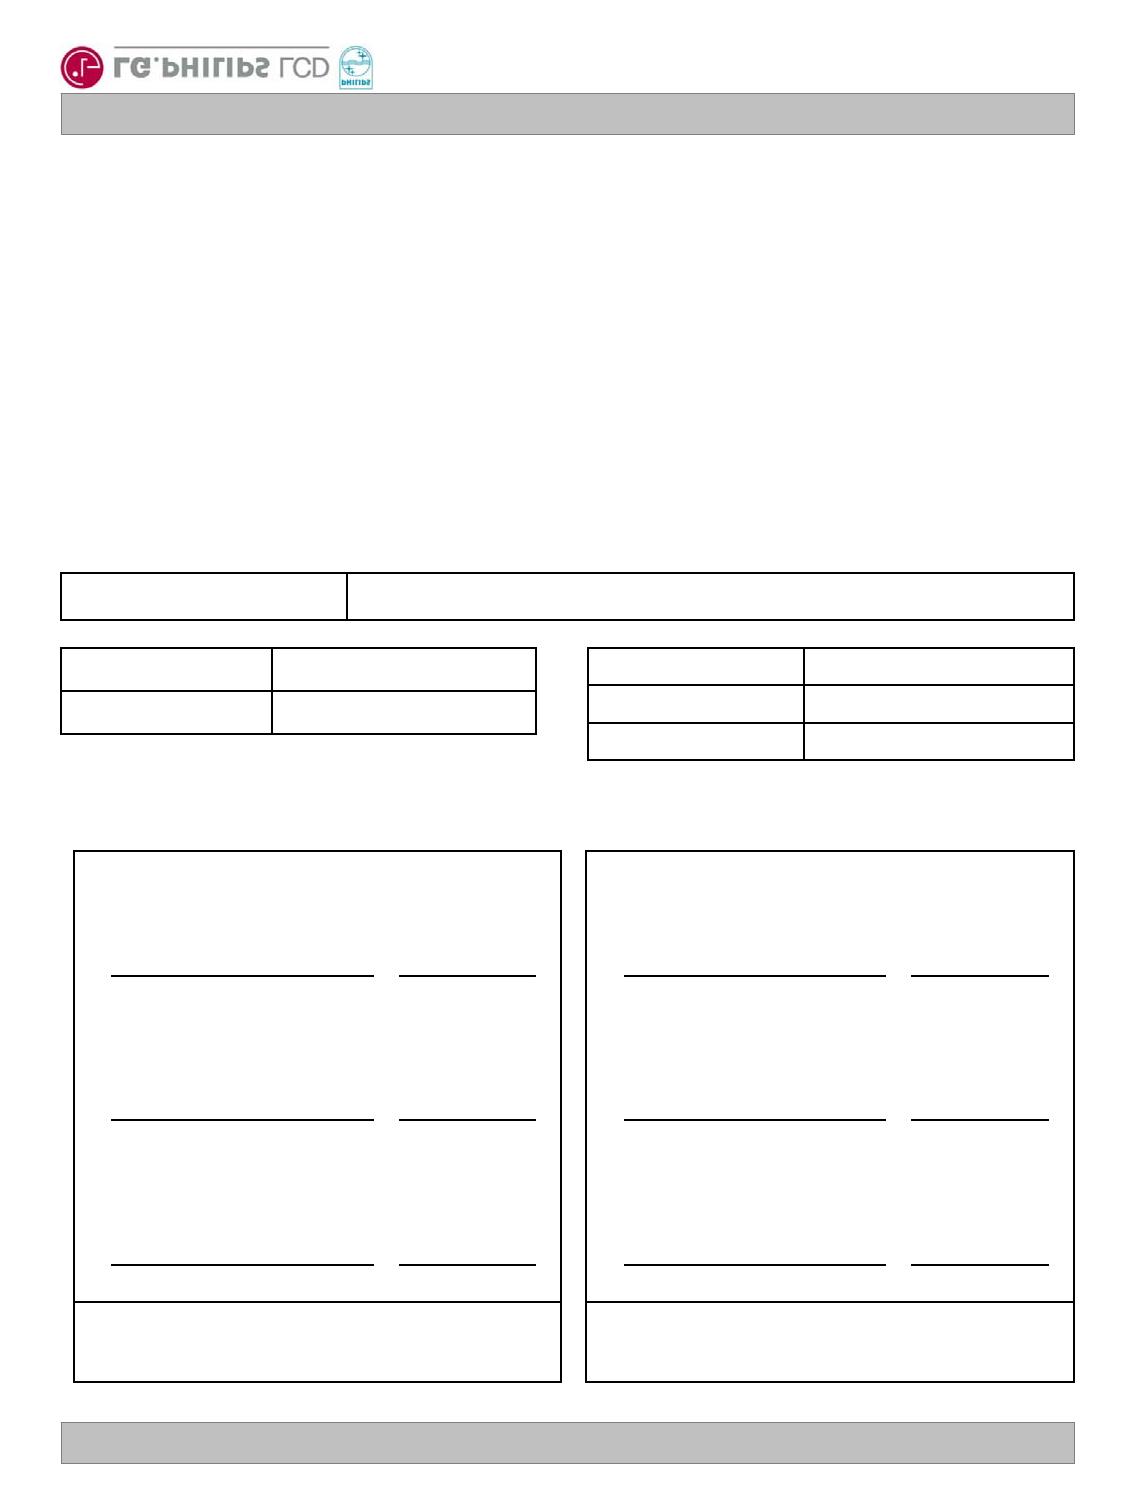 LC320W01-B6K3 datasheet